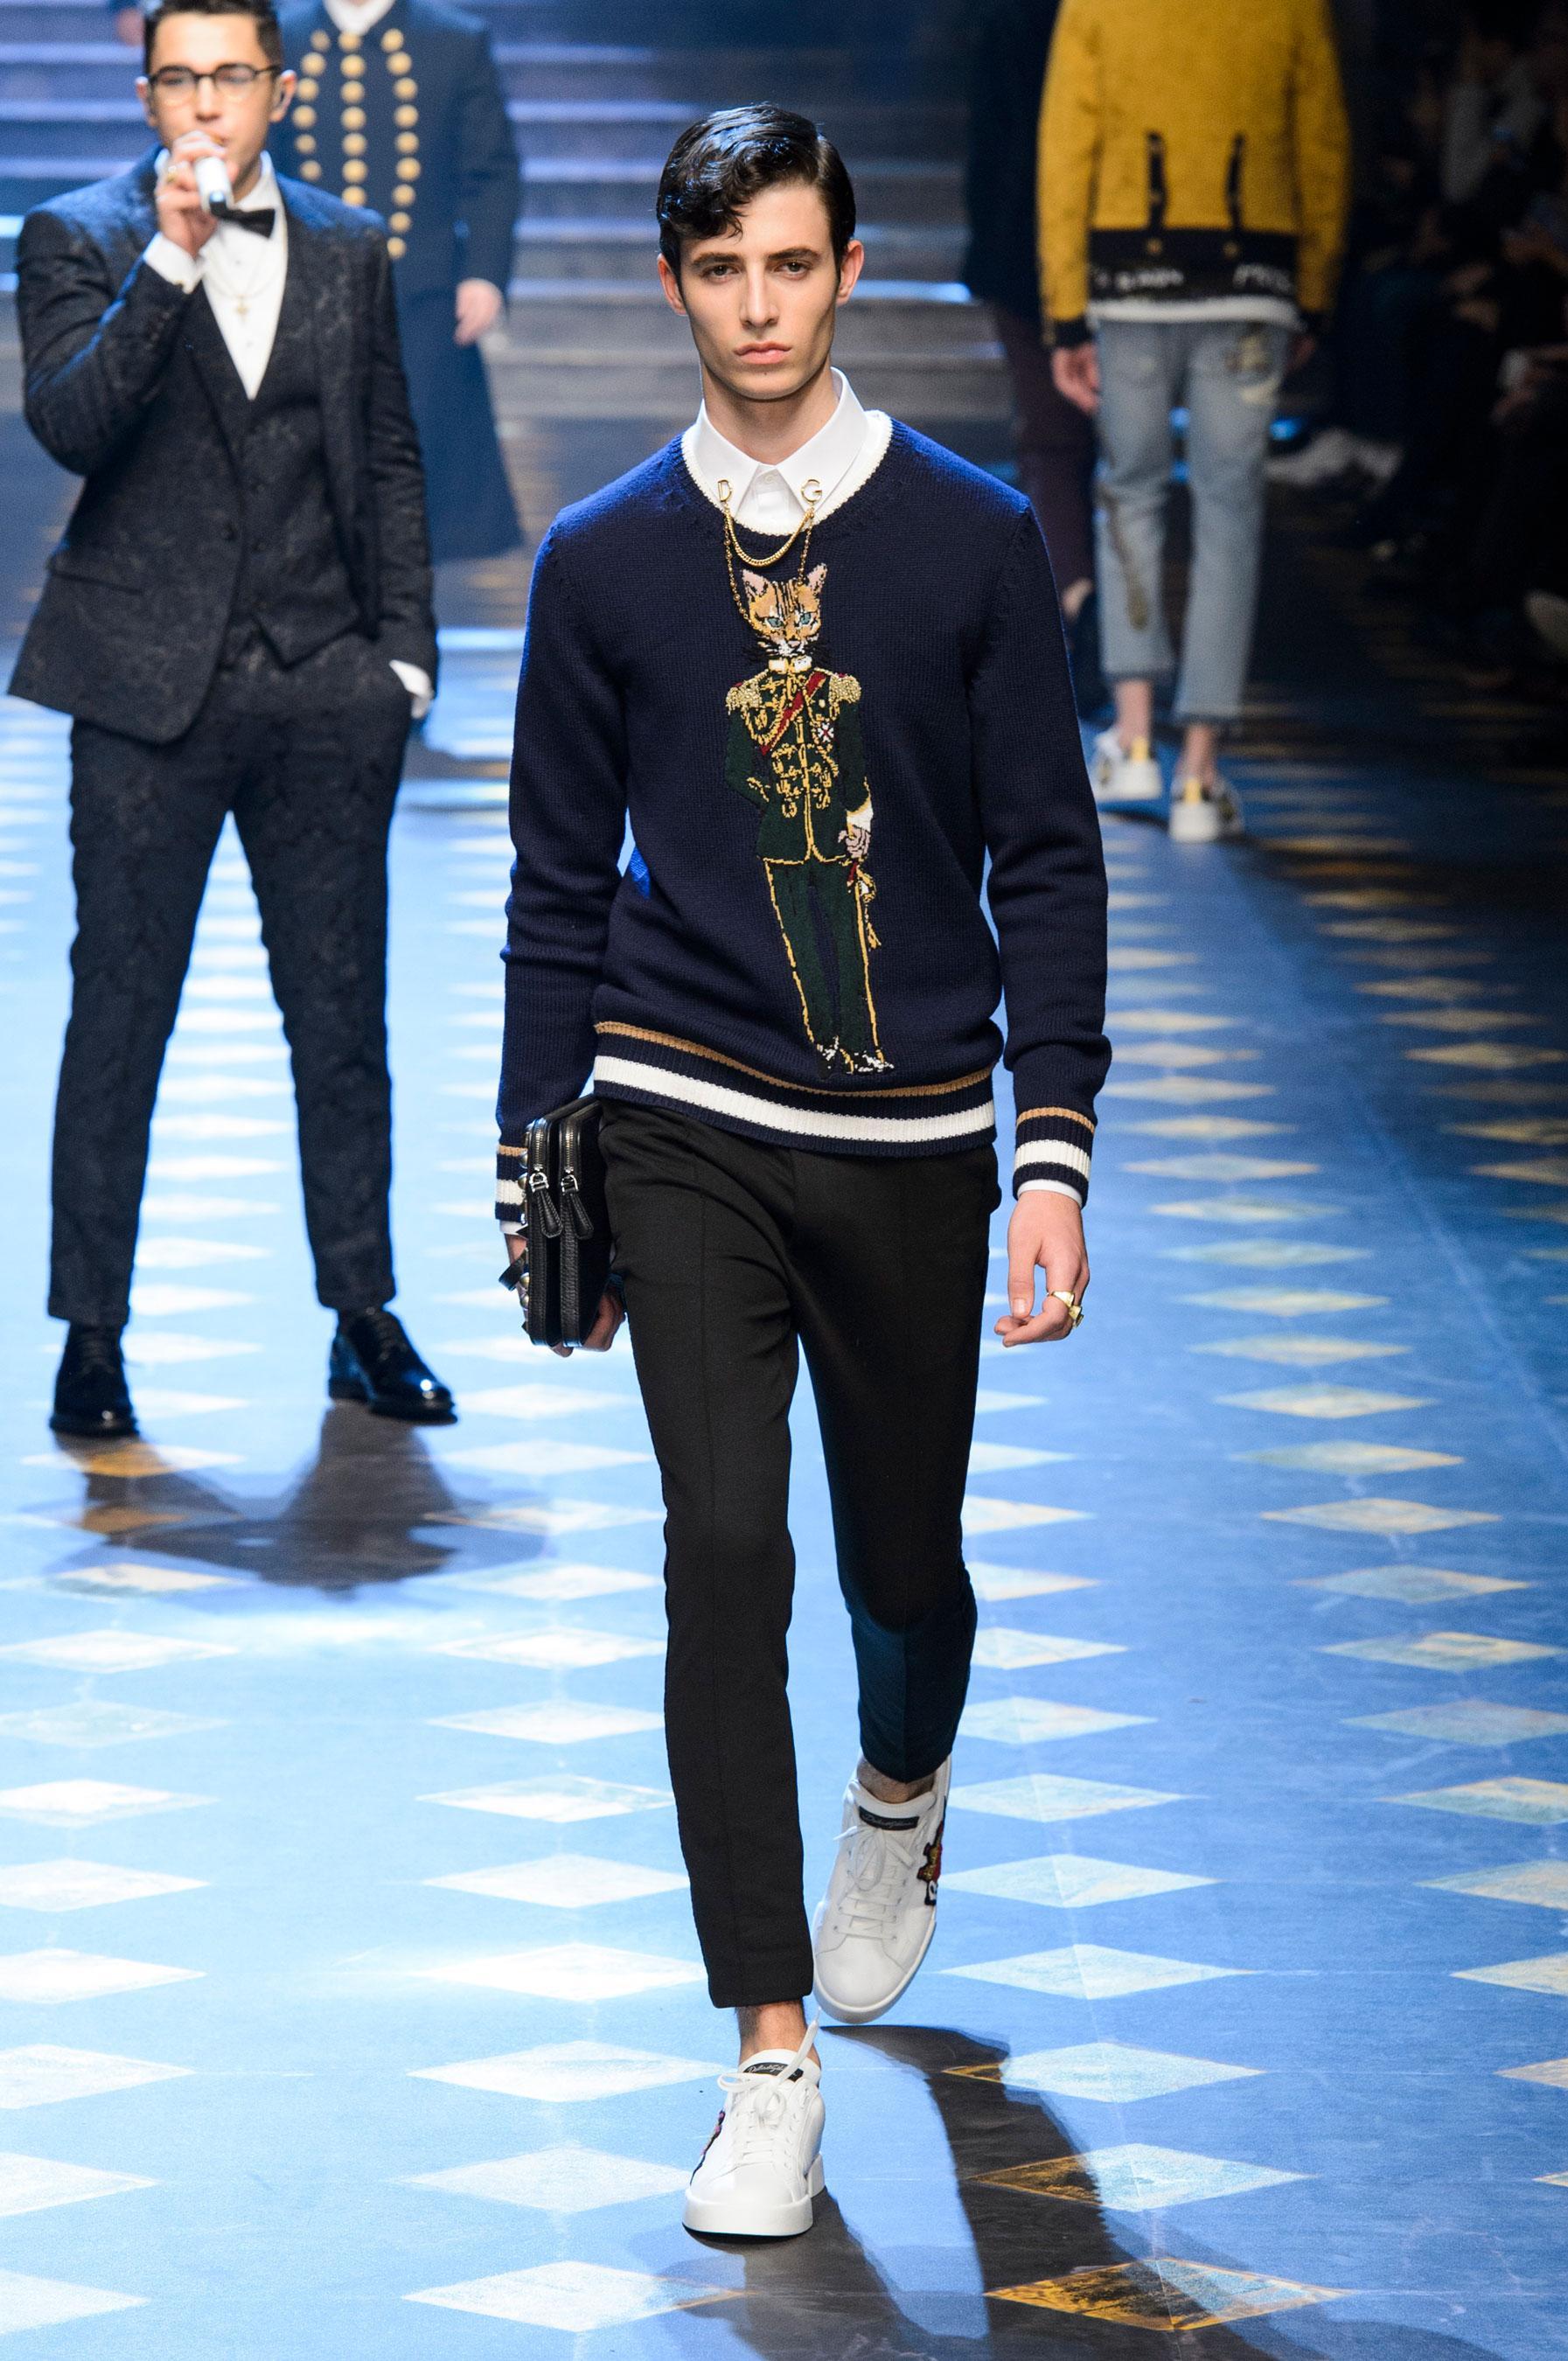 Défilé Dolce \u0026 Gabbana automne,hiver 2017,2018, Milan , Look 19.